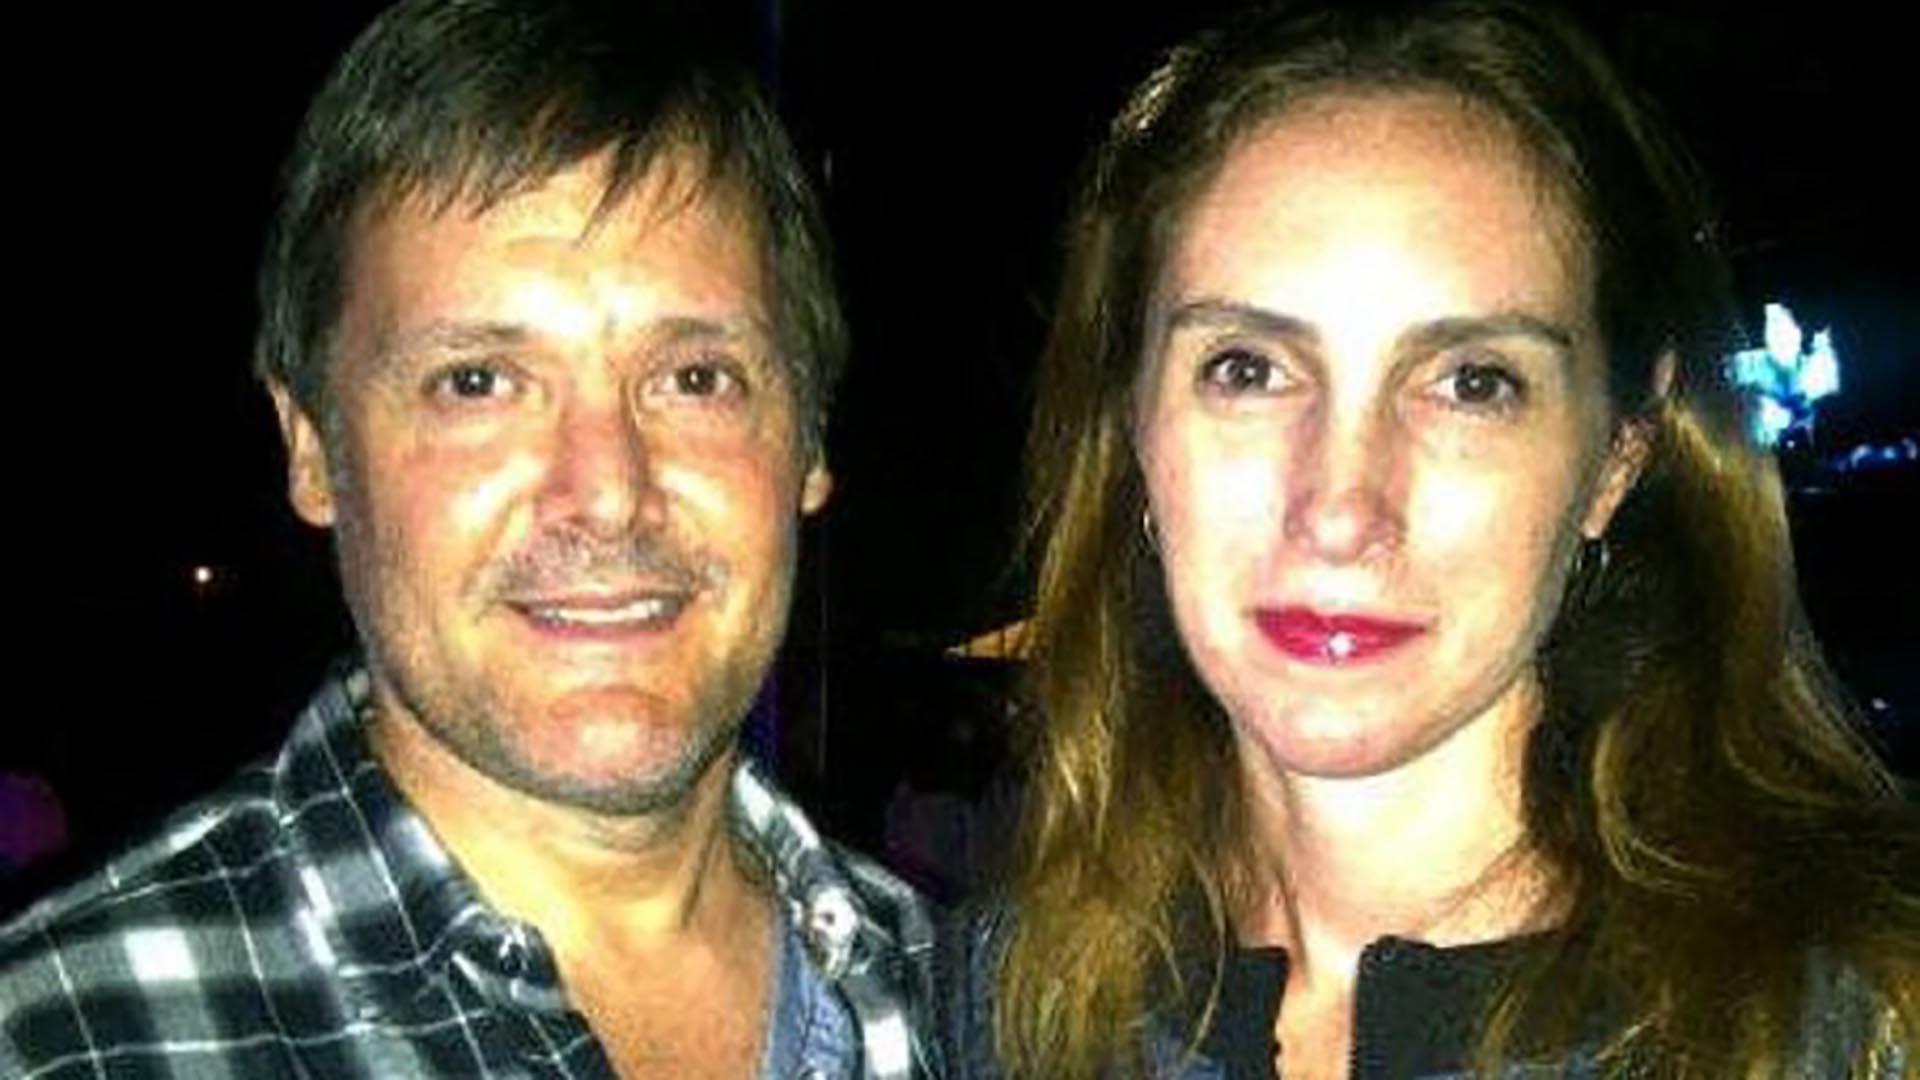 Fernando Farré y Claudia Schaefer